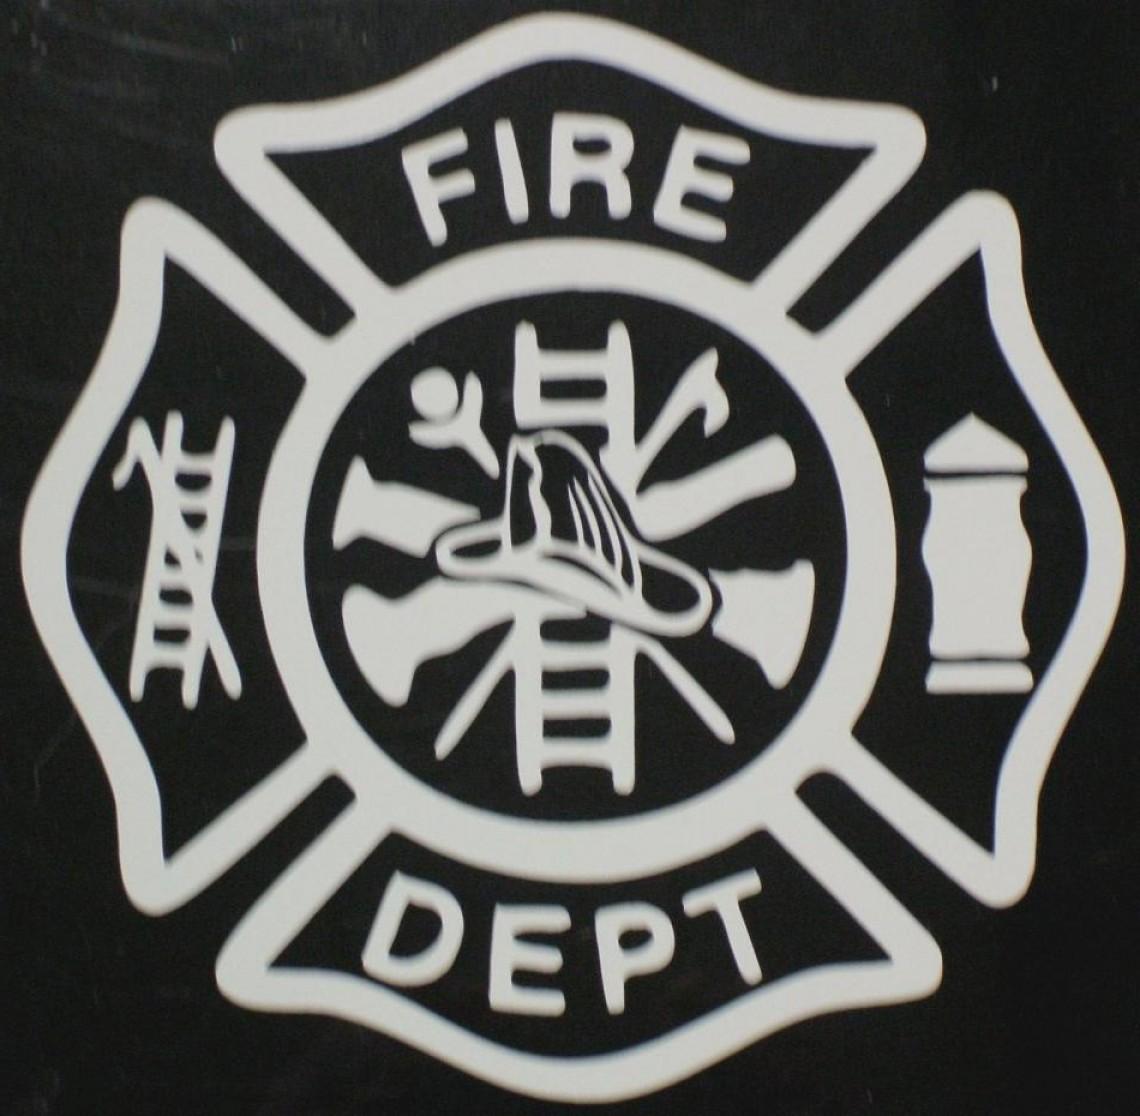 1140x1116 Best Fireman Maltese Cross Vector Image Collection